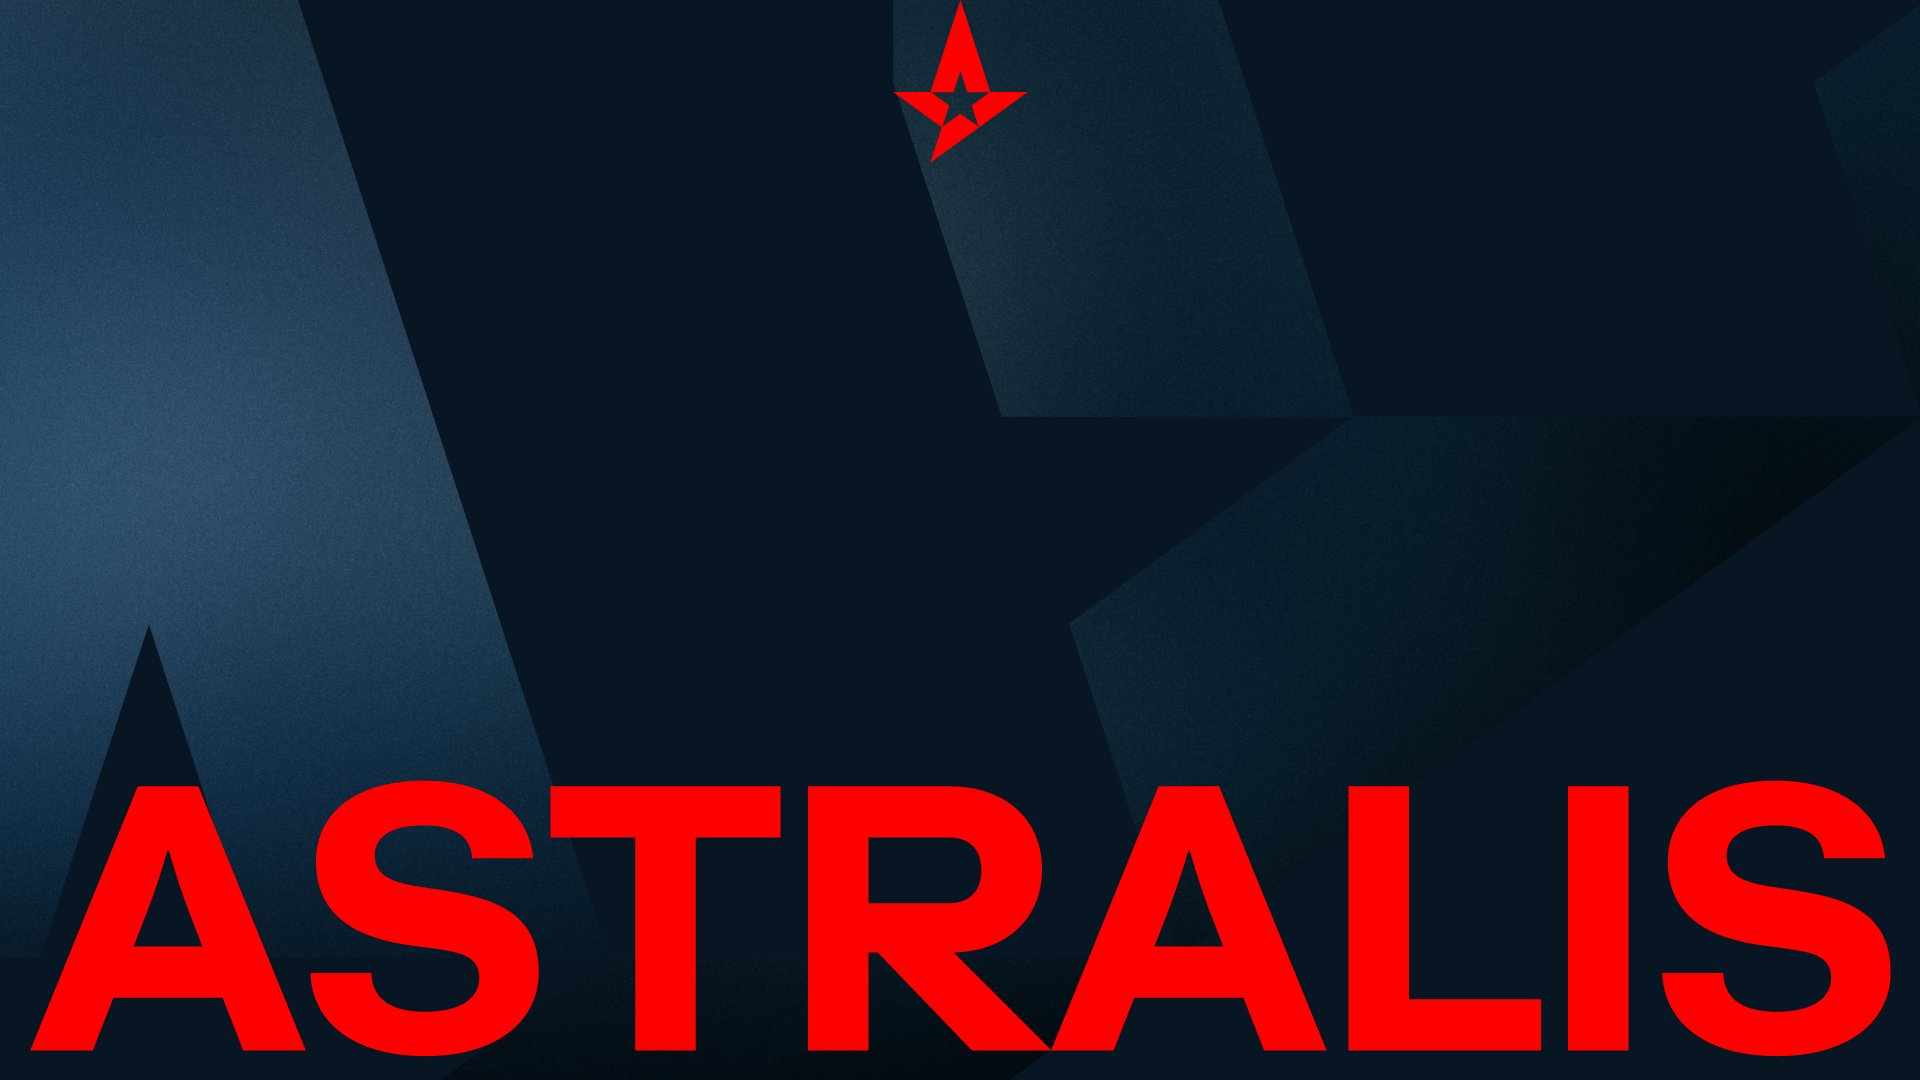 LEC官方:因拖欠队员工资 对Astralis罚款5000欧